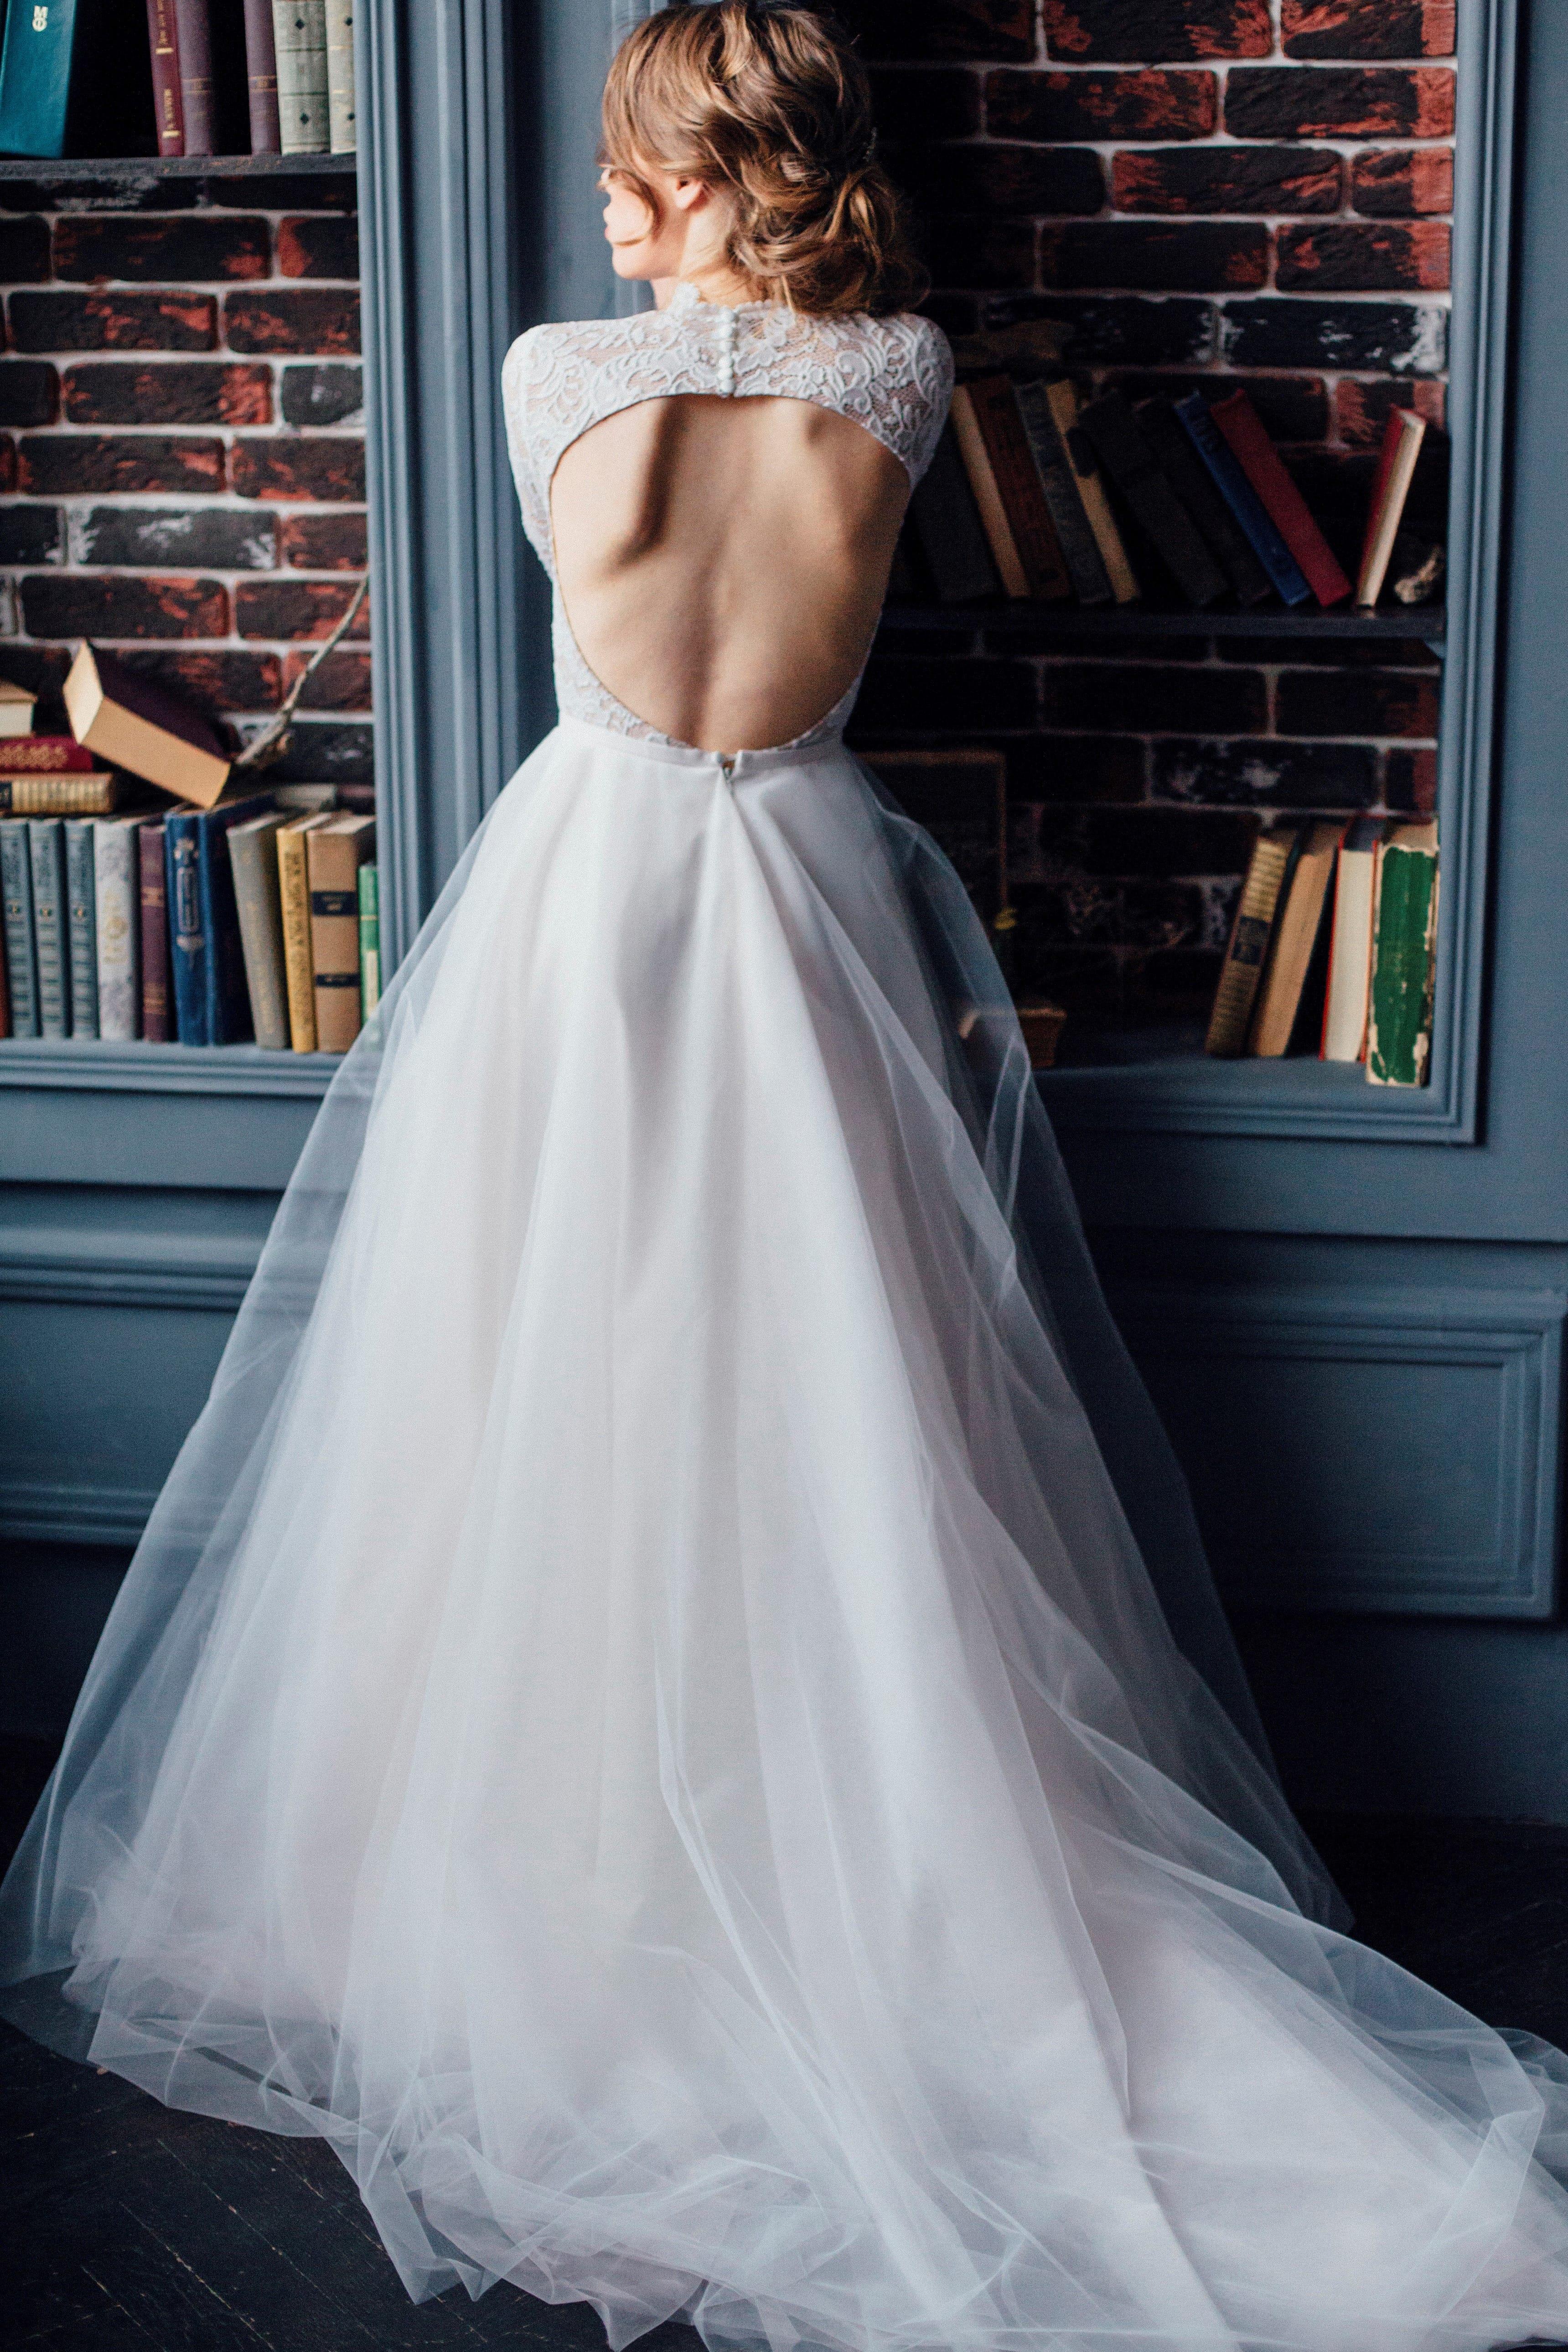 Свадебное платье KIMBERLY, коллекция THE ABSOLUTE LOVE, бренд RARE BRIDAL, фото 1